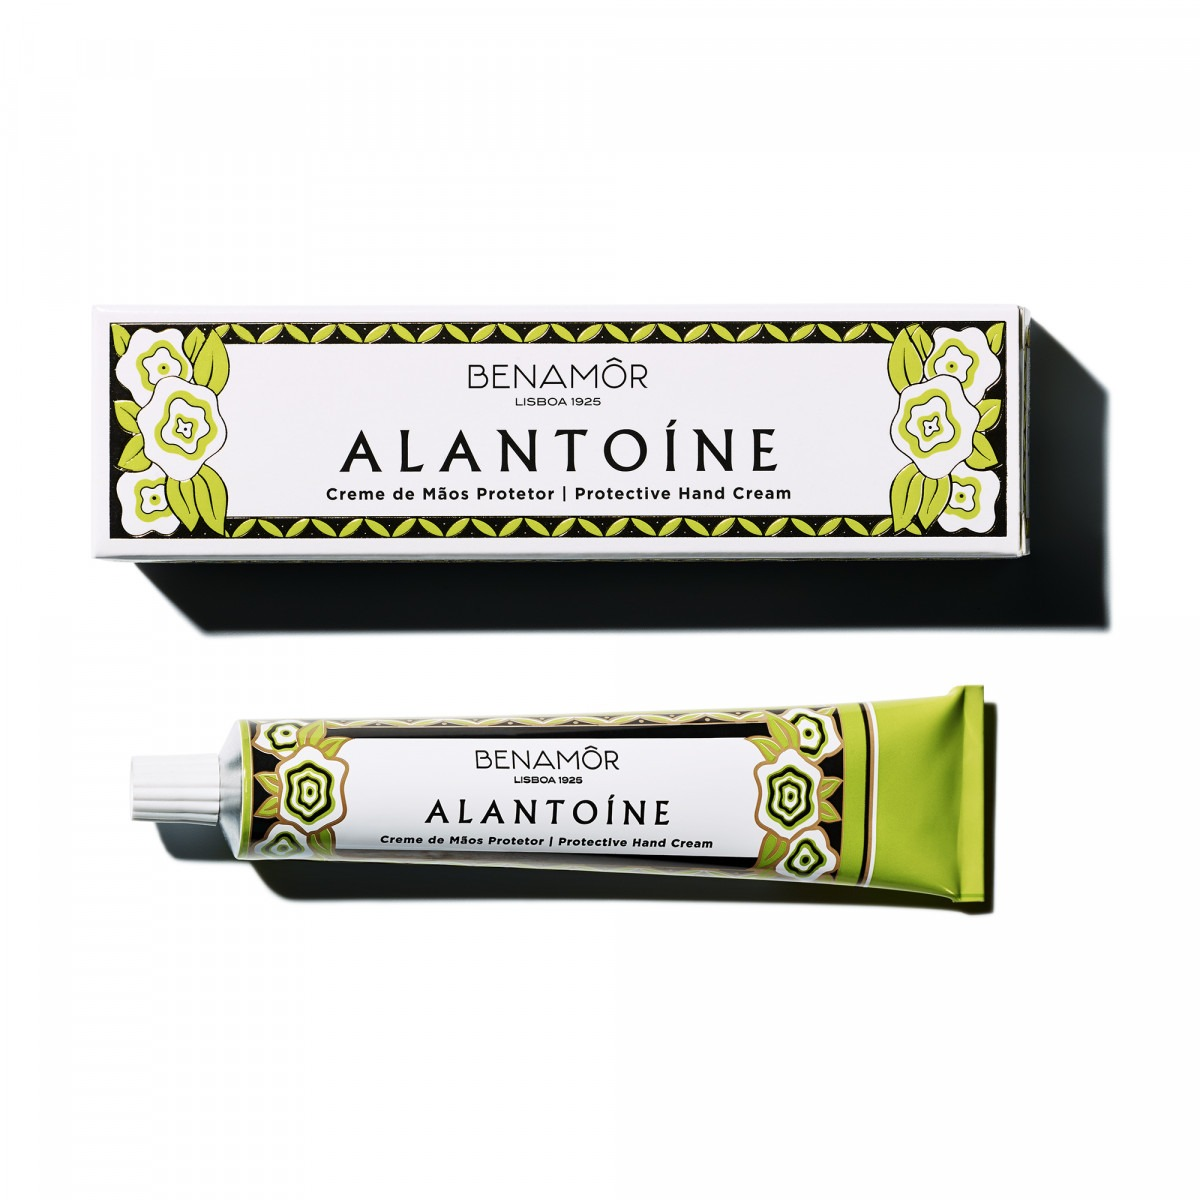 Benamor Alantoíne Protective Hand Cream 50ml